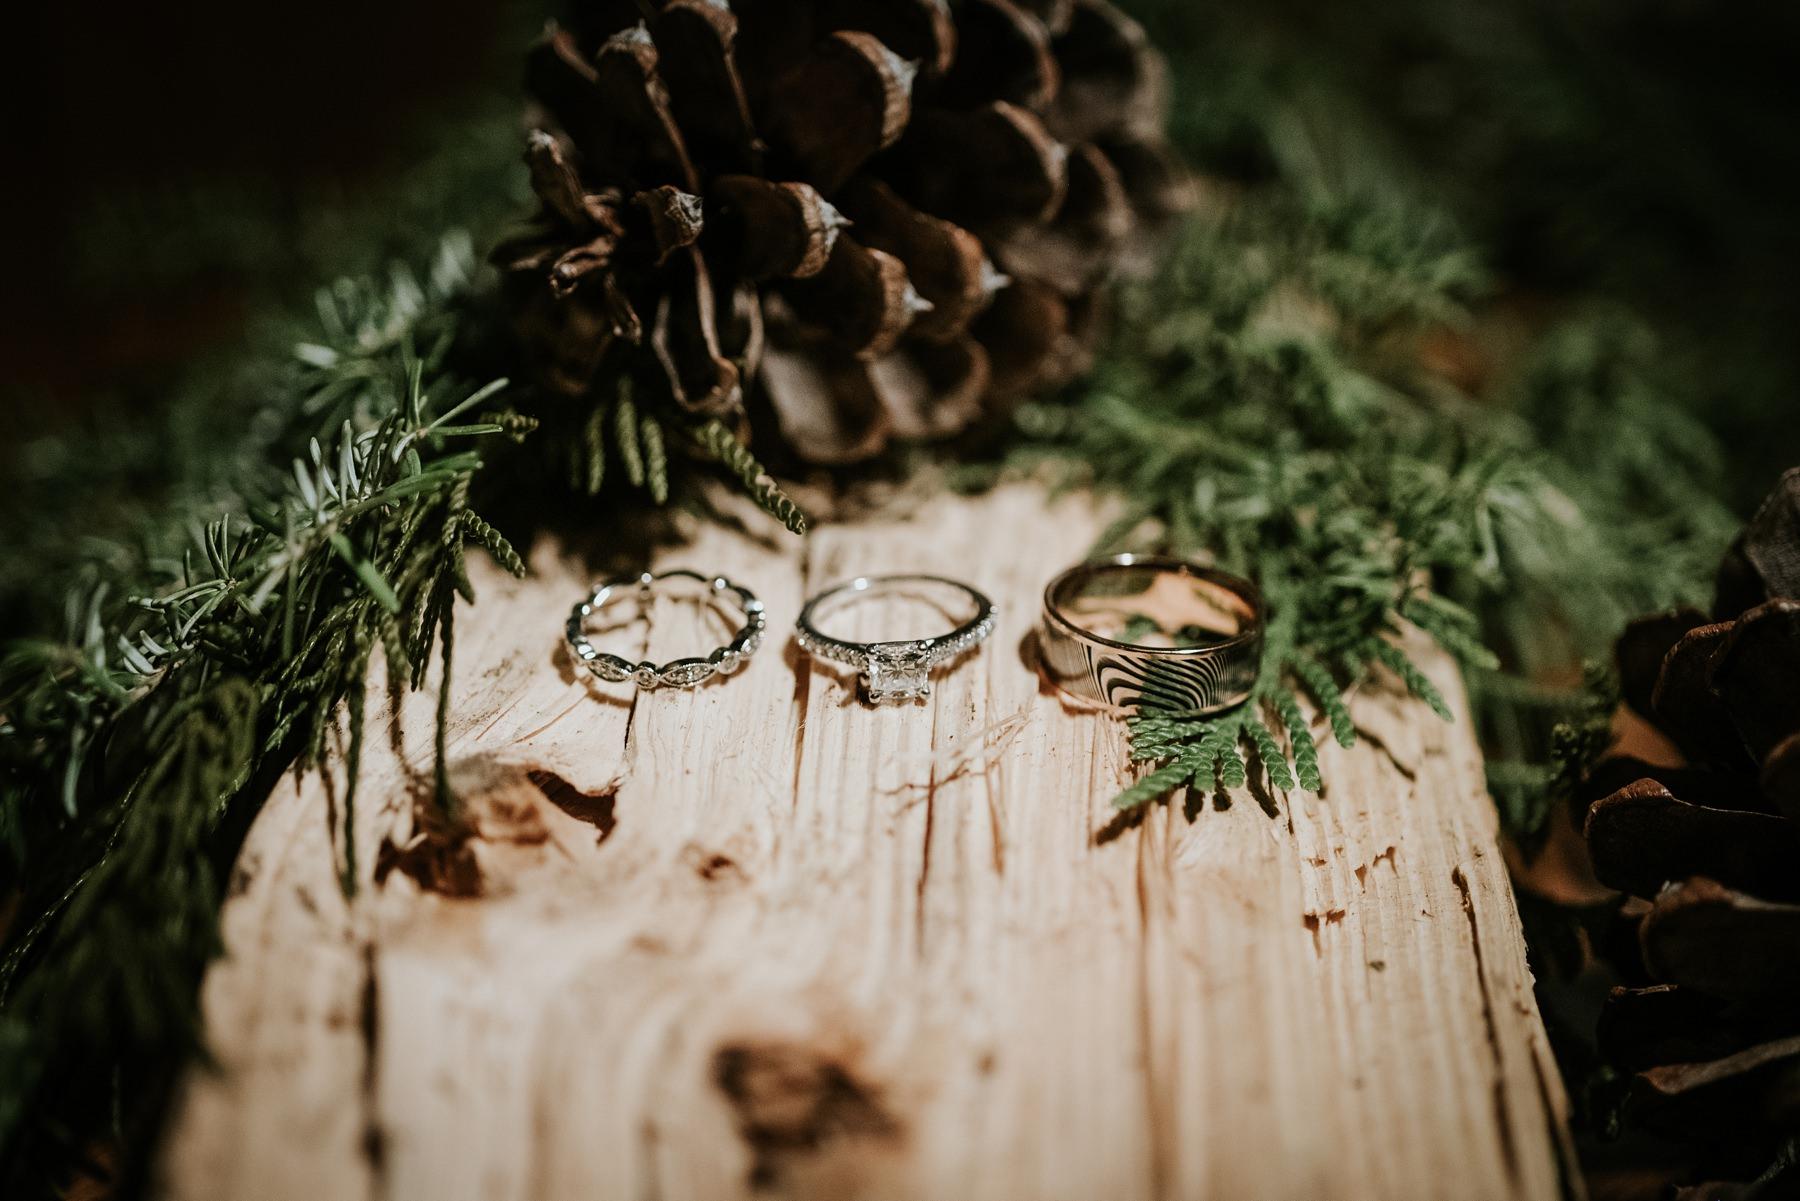 engagement and wedding band detail shot